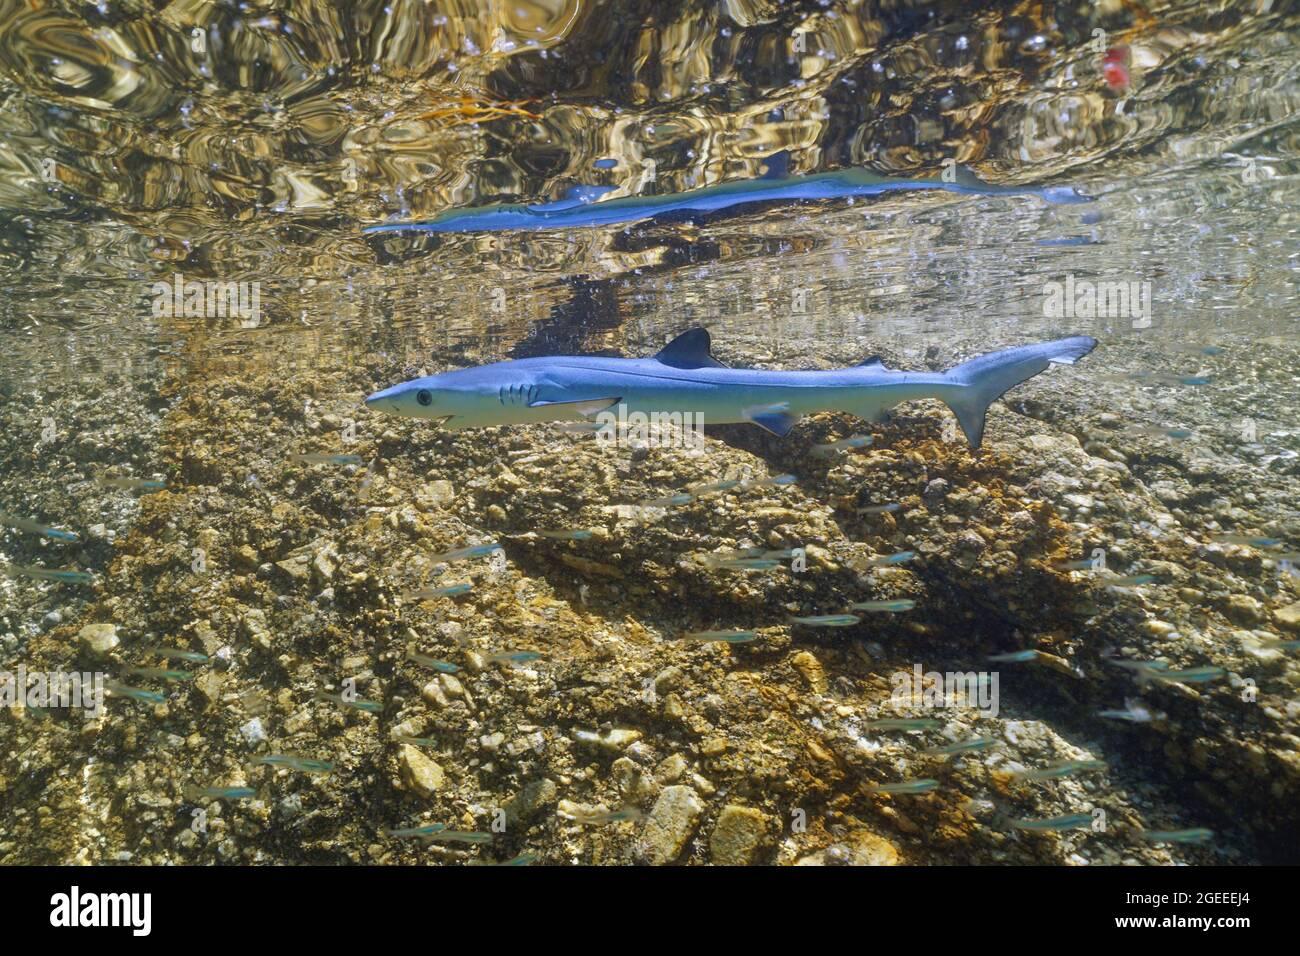 A juvenile blue shark, Prionace glauca, underwater near rocky seashore, Atlantic ocean, Galicia, Spain Stock Photo